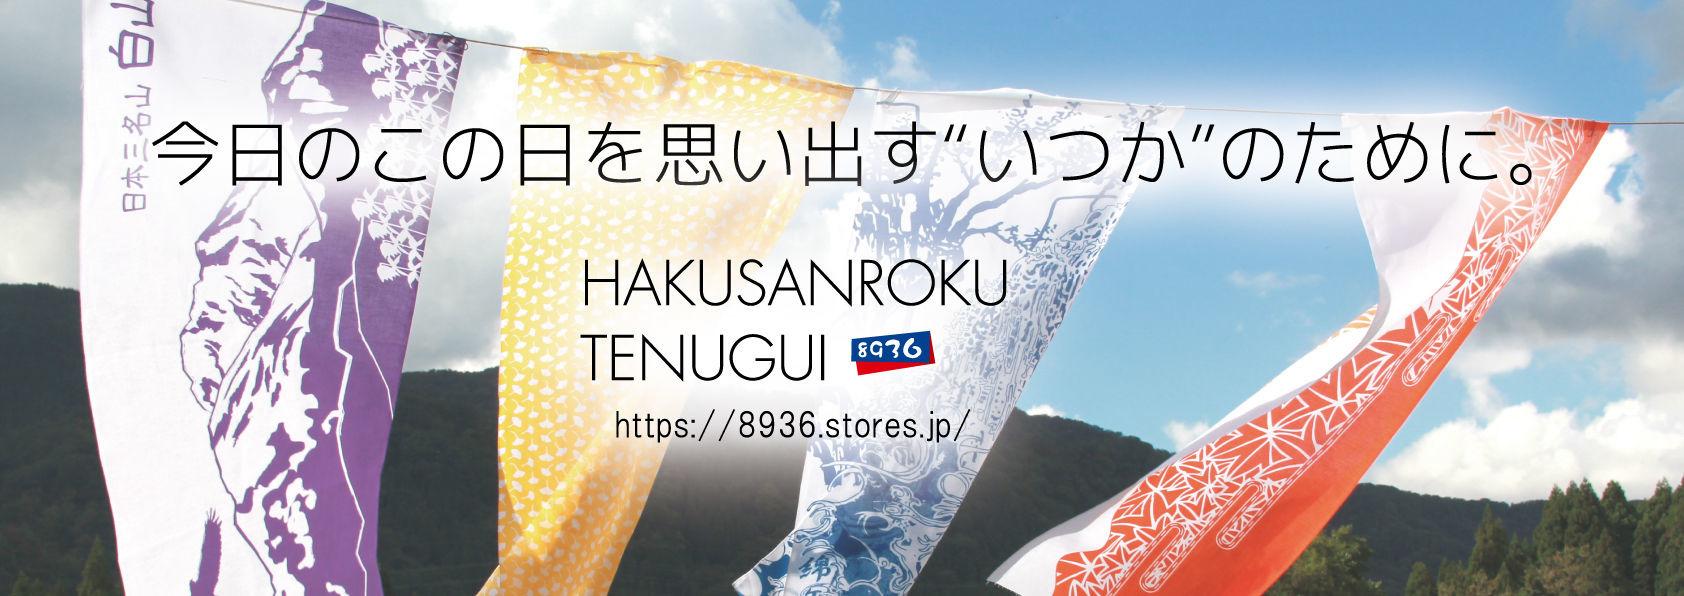 HAKUSANROKU TENUGUI~8936テヌグイ~ (白山麓の地域資源をデザイン化した和手ぬぐい)